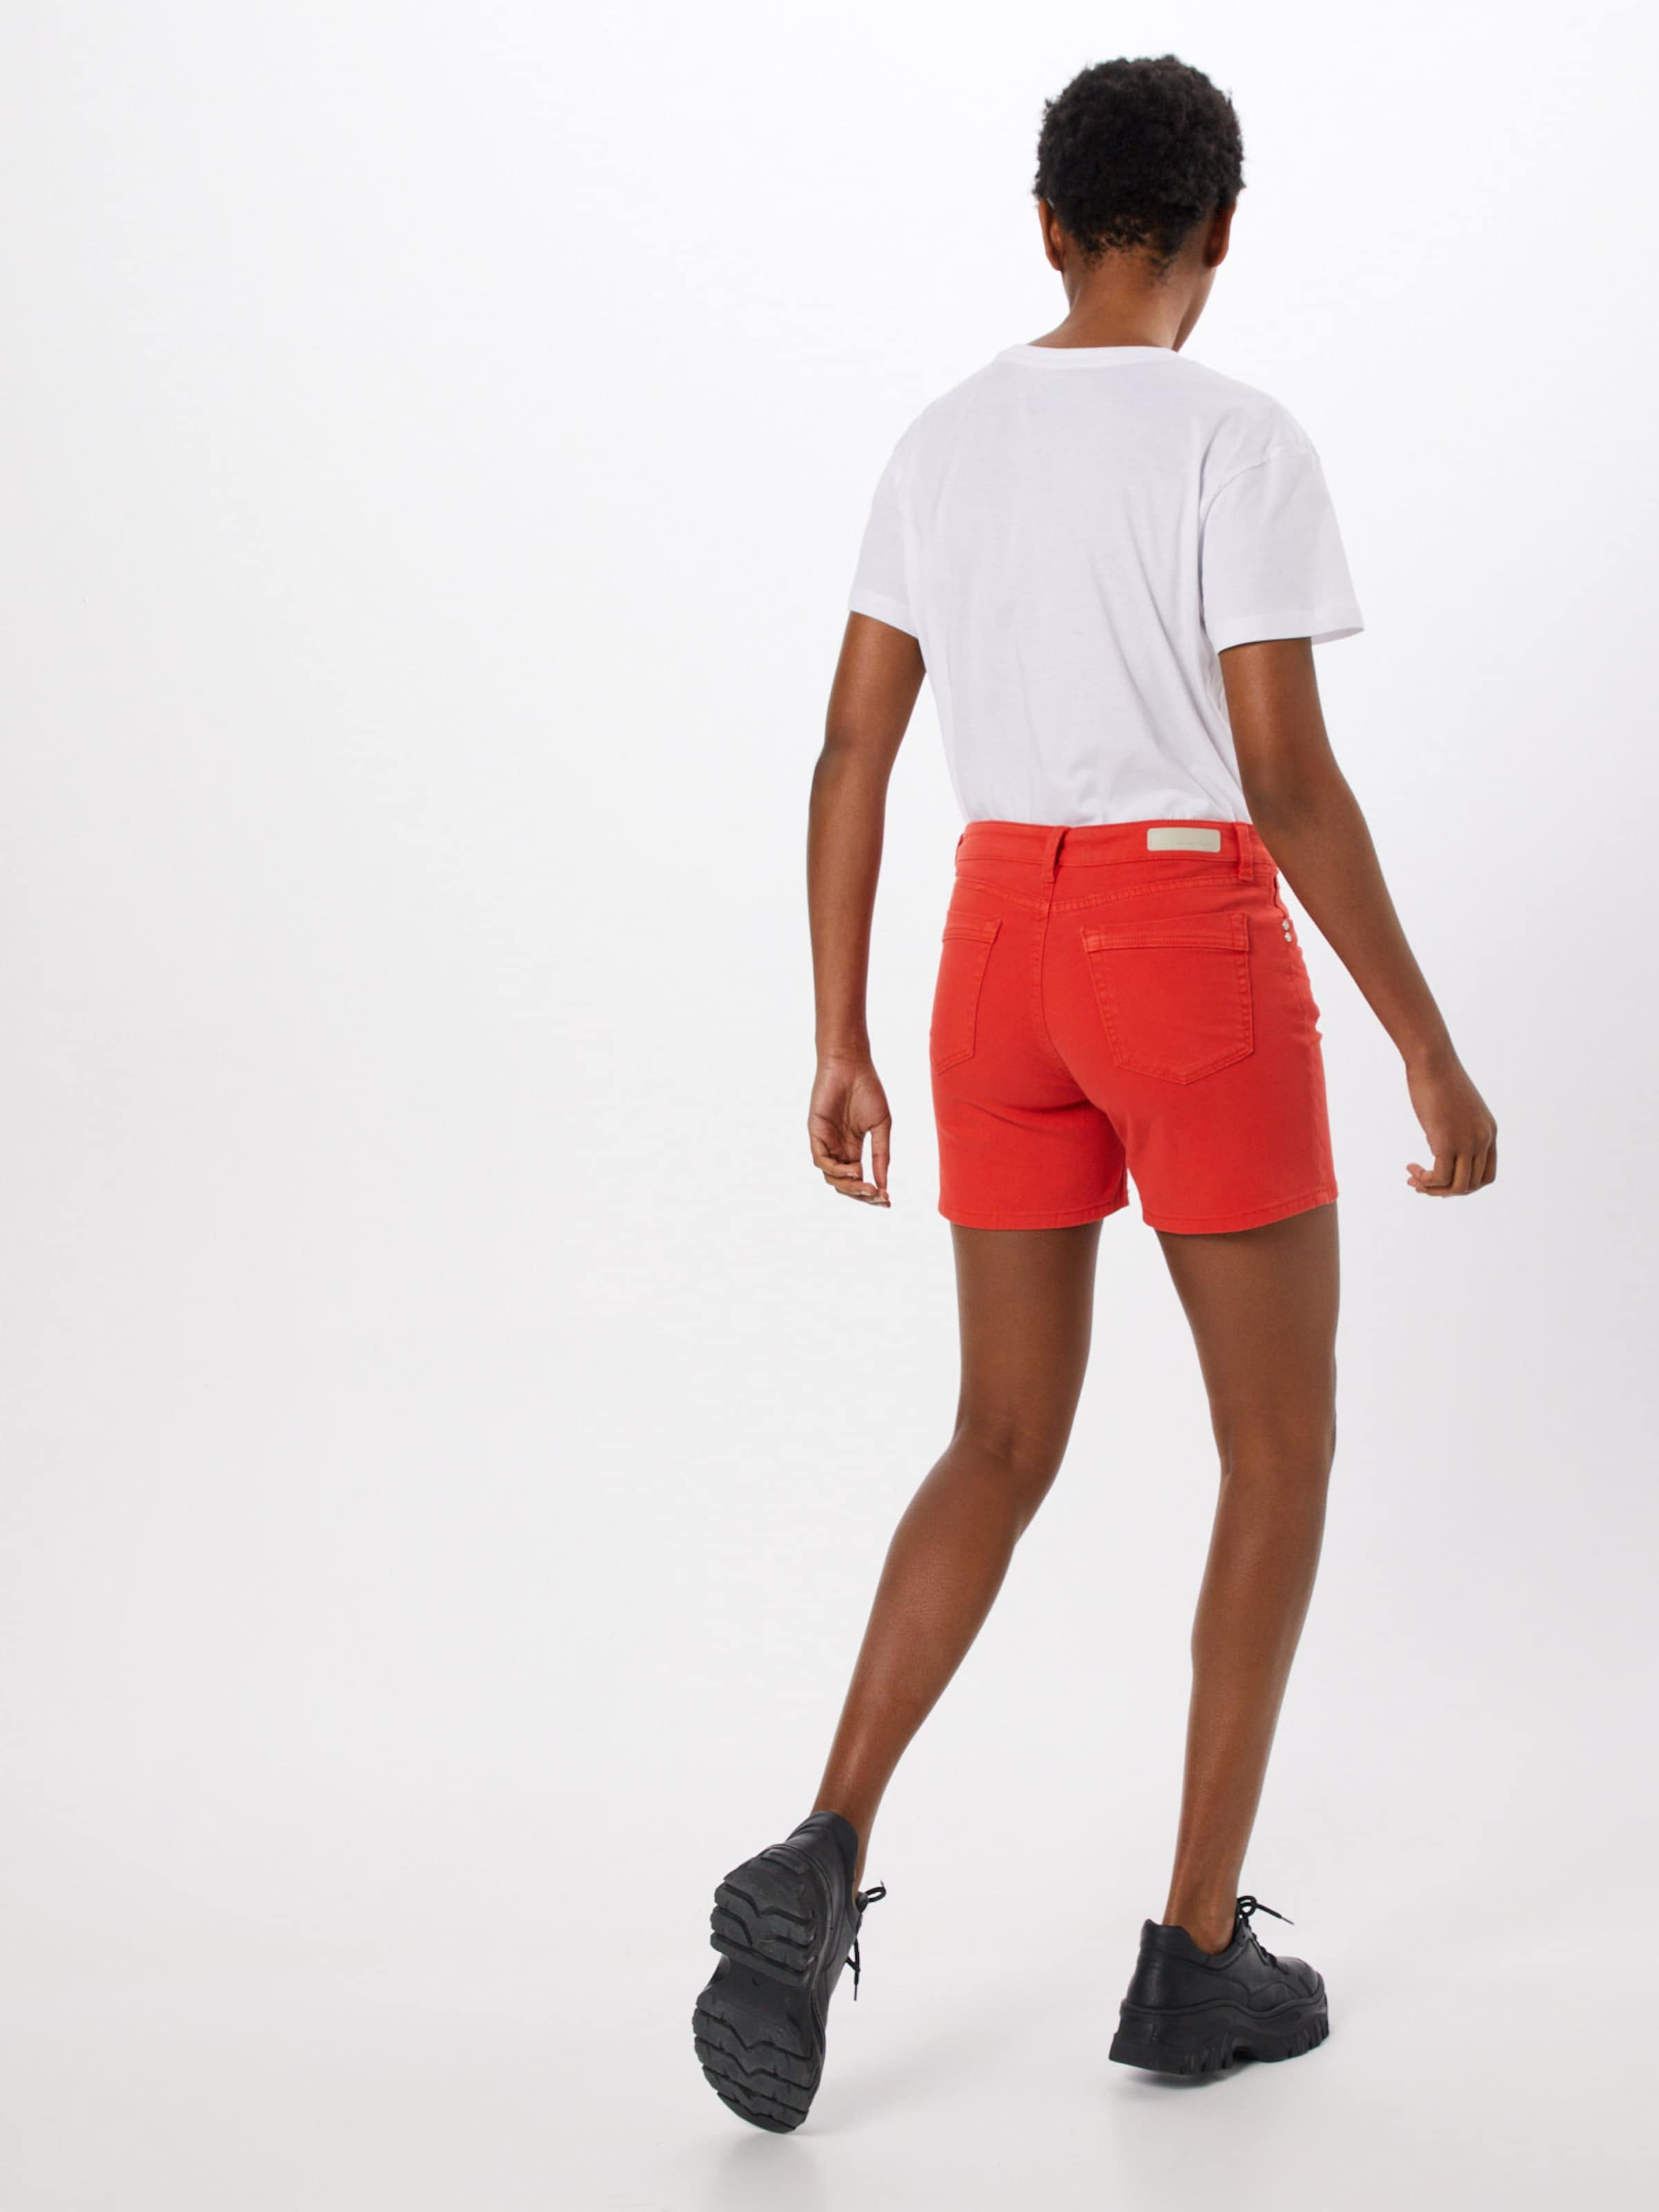 Denim Shorts Tom Tailor 'cajsa' In Orangerot Nn0vm8w